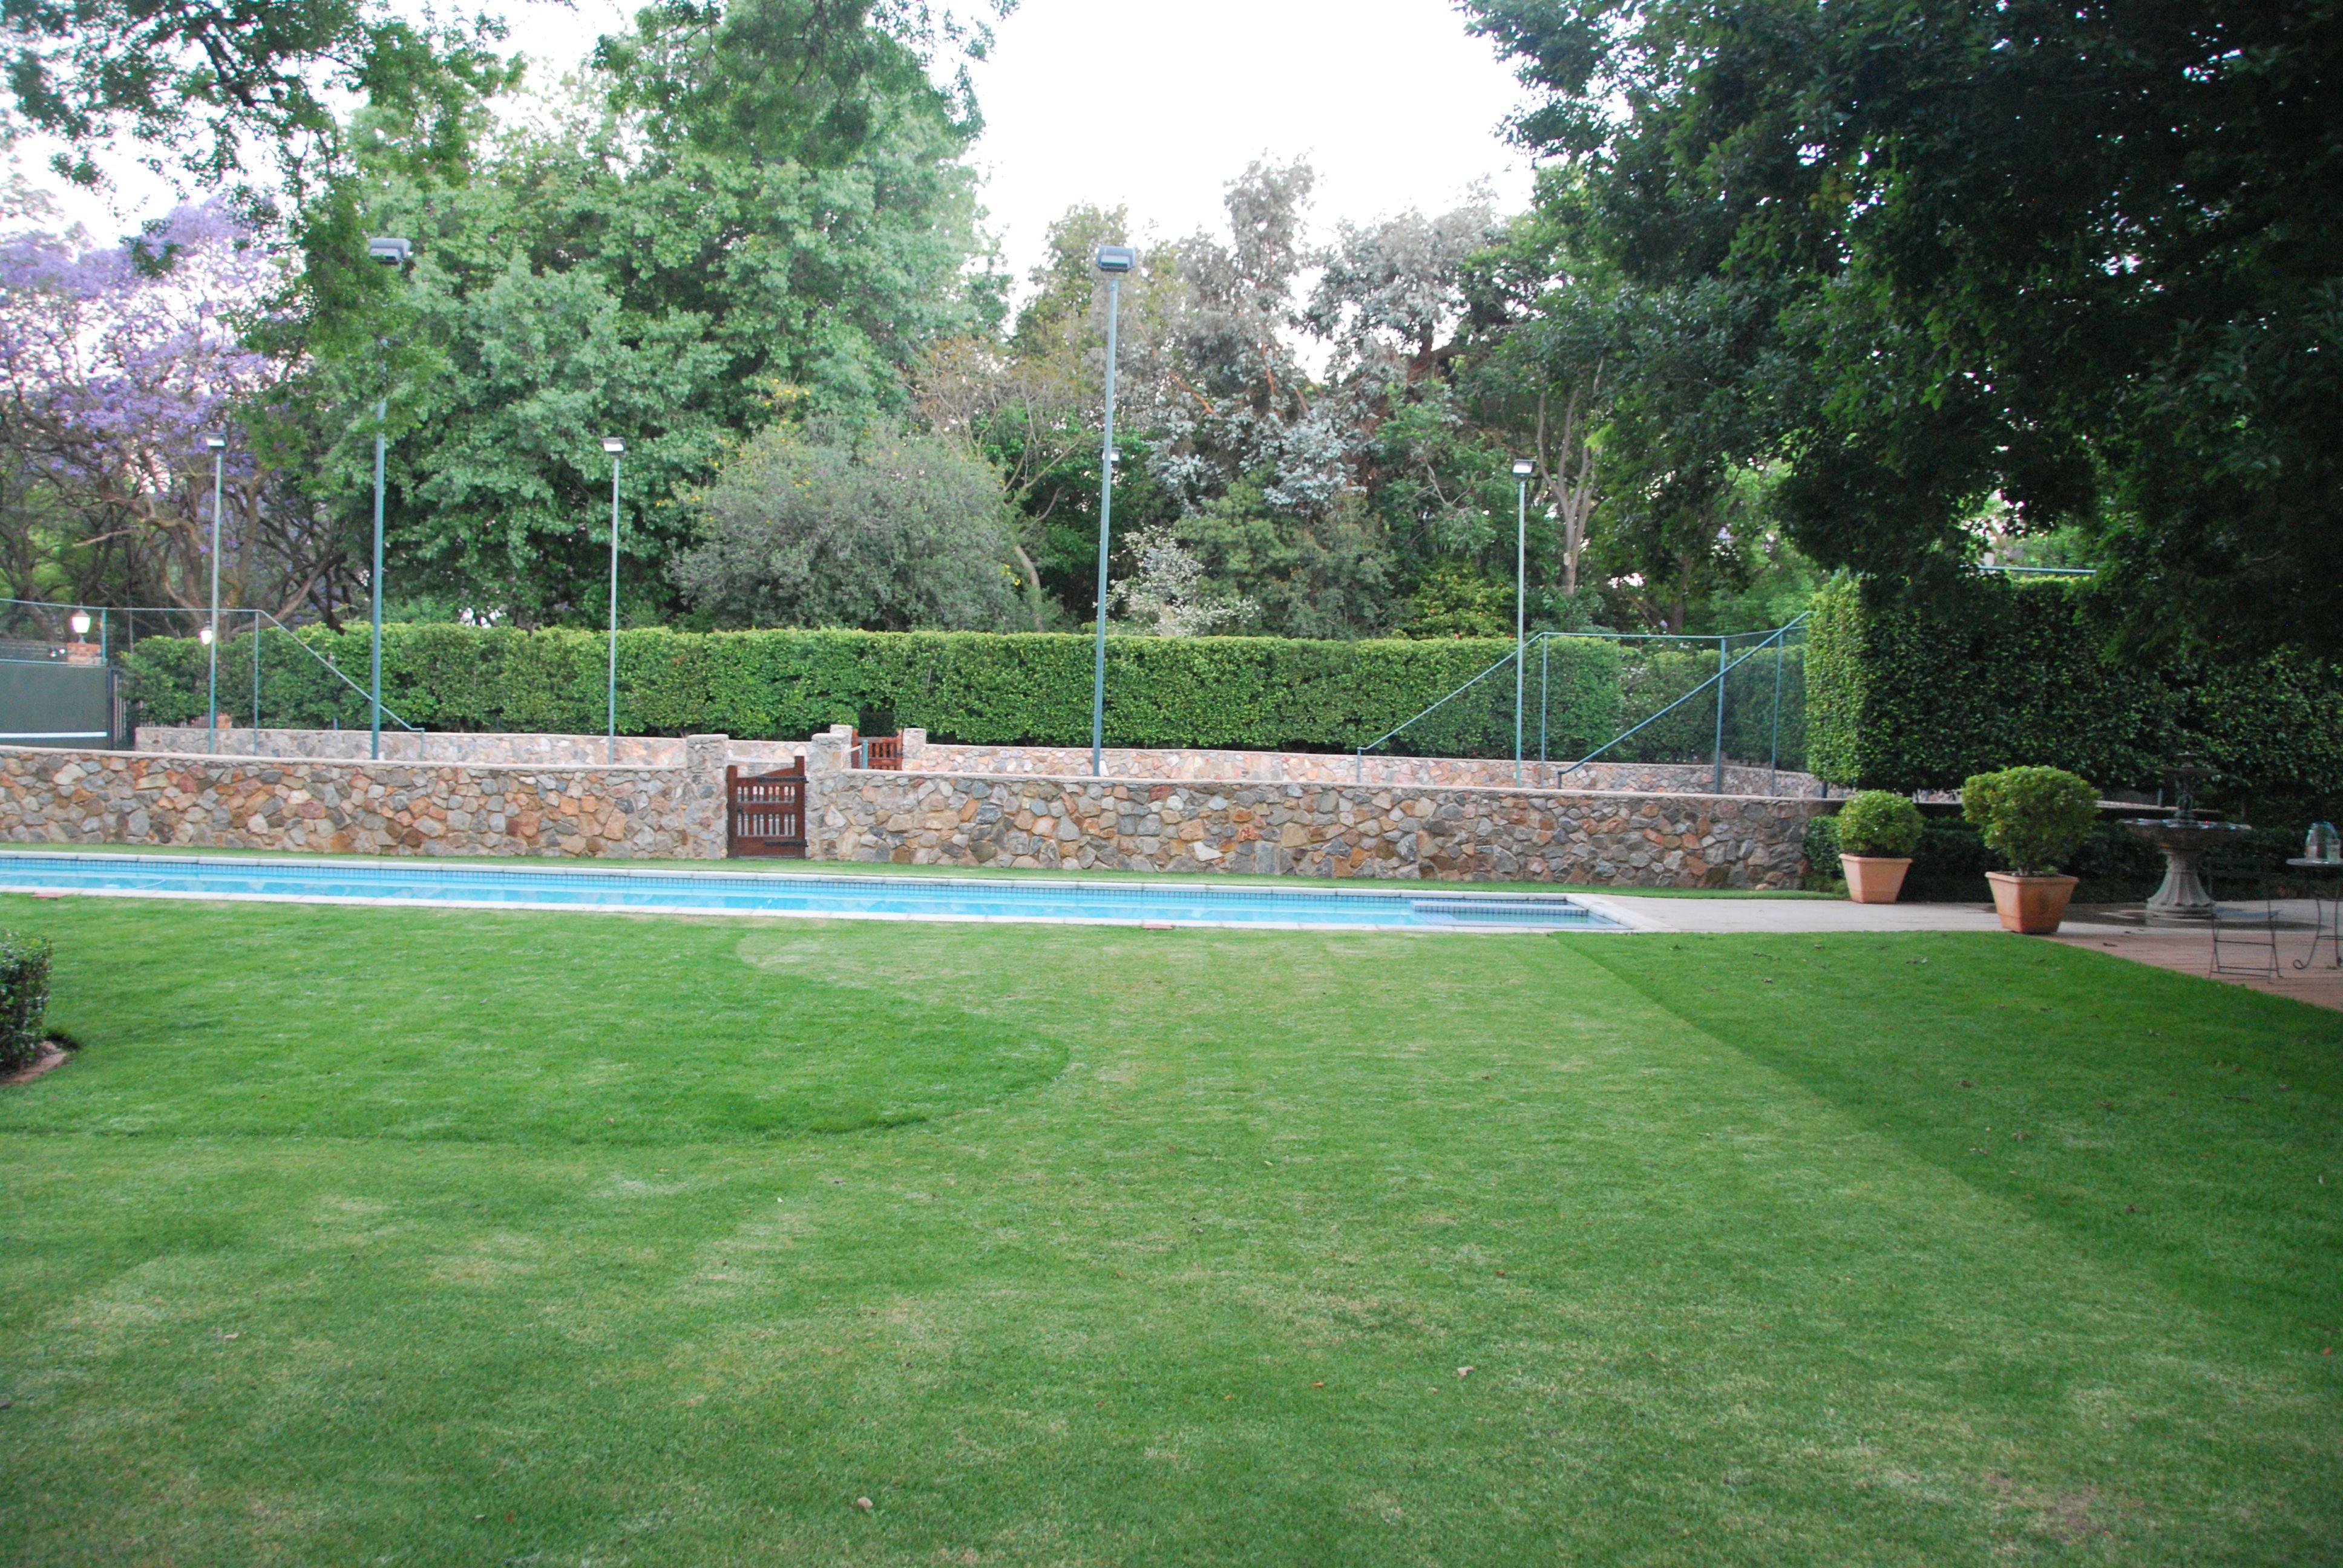 Tennis Court Hedge Tennis, Hedges, Golf courses